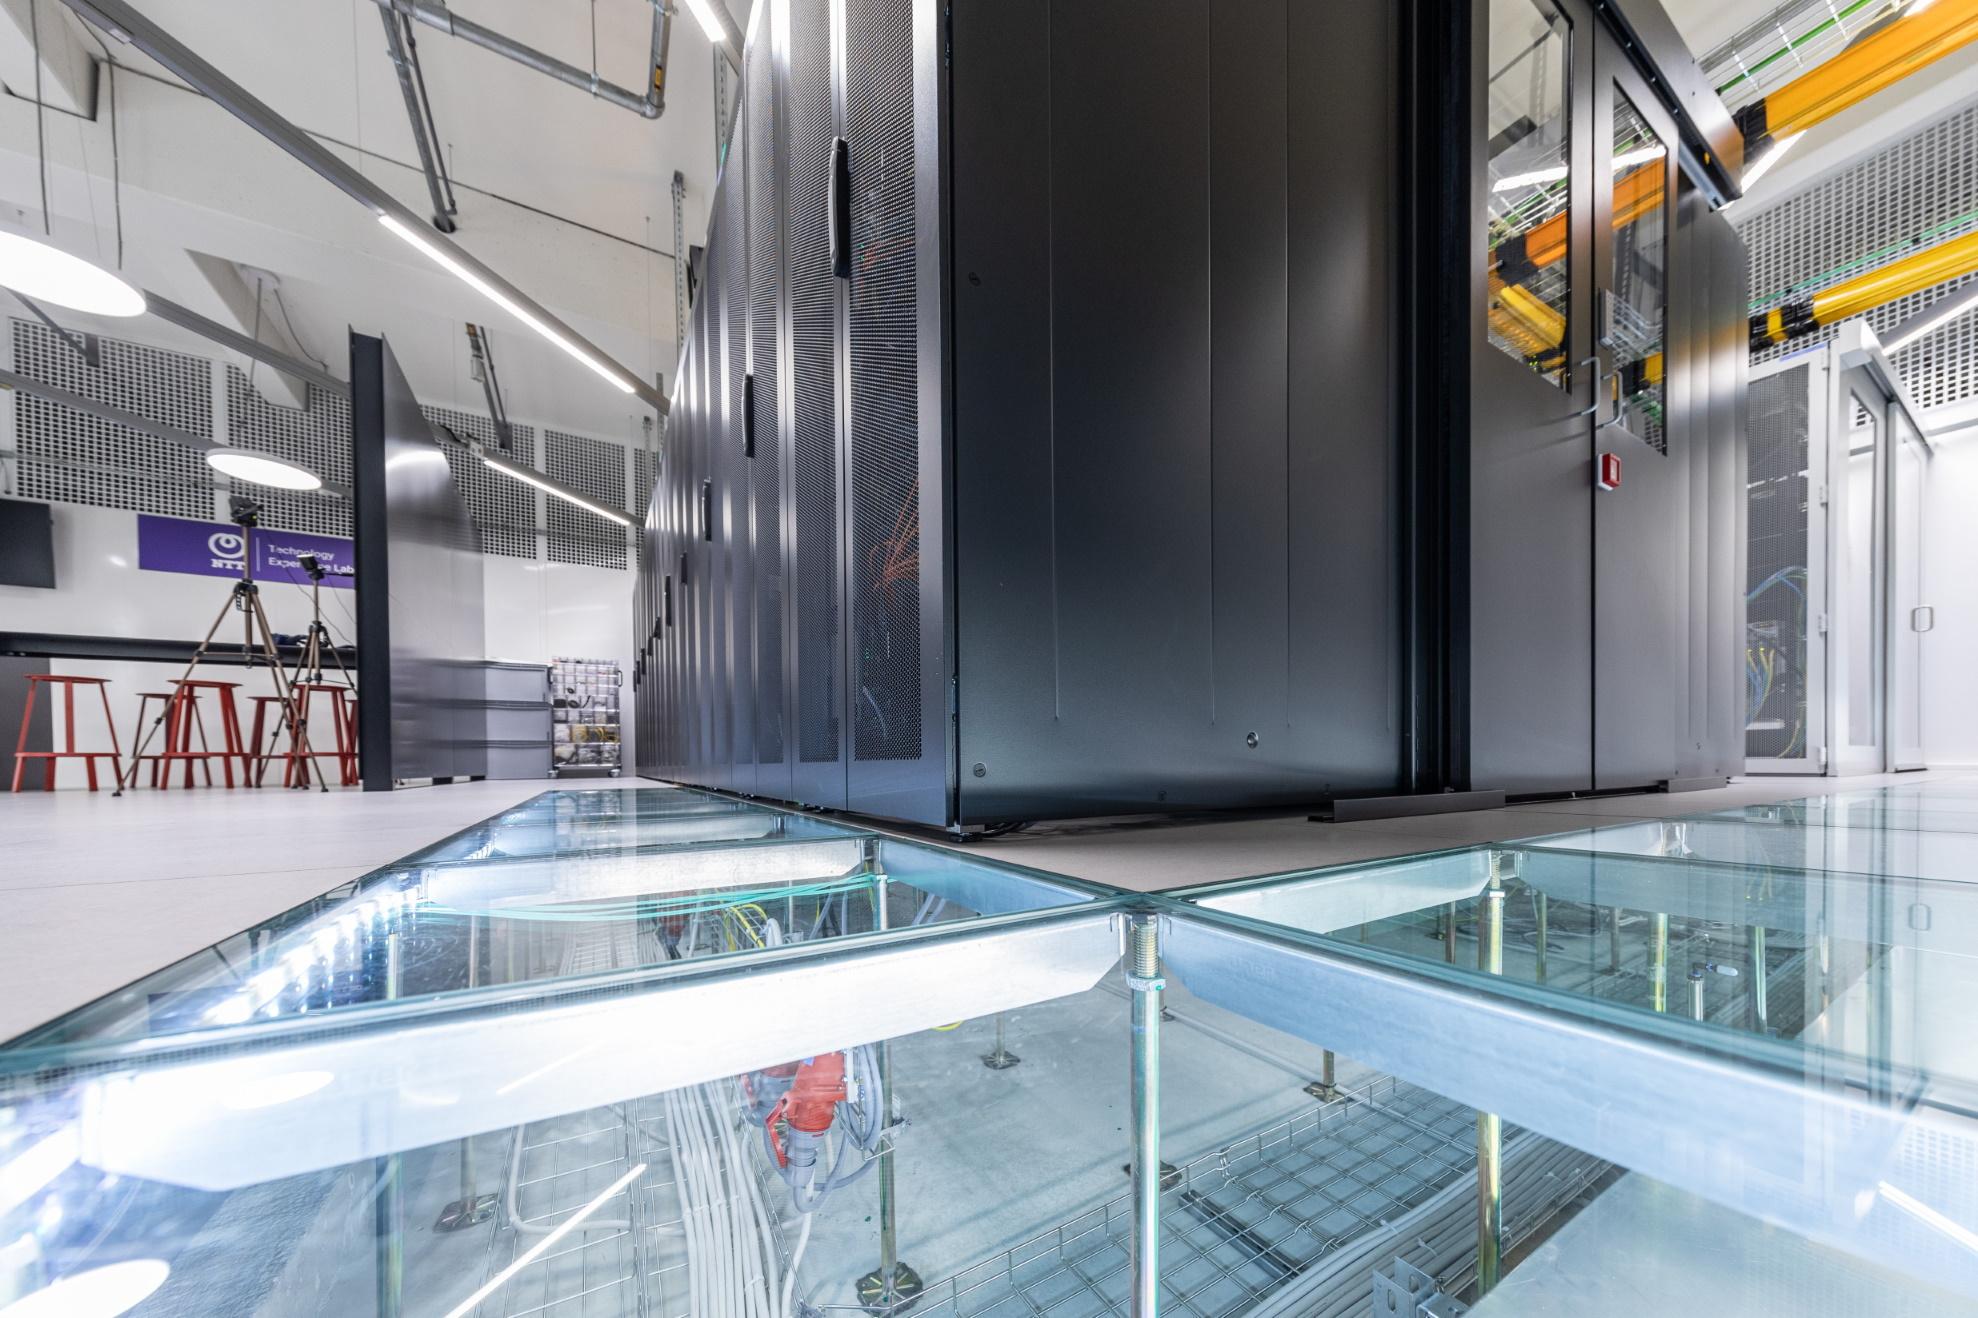 Rosenberger OSI diventa partner del Technology Experience Lab di NTT a Francoforte